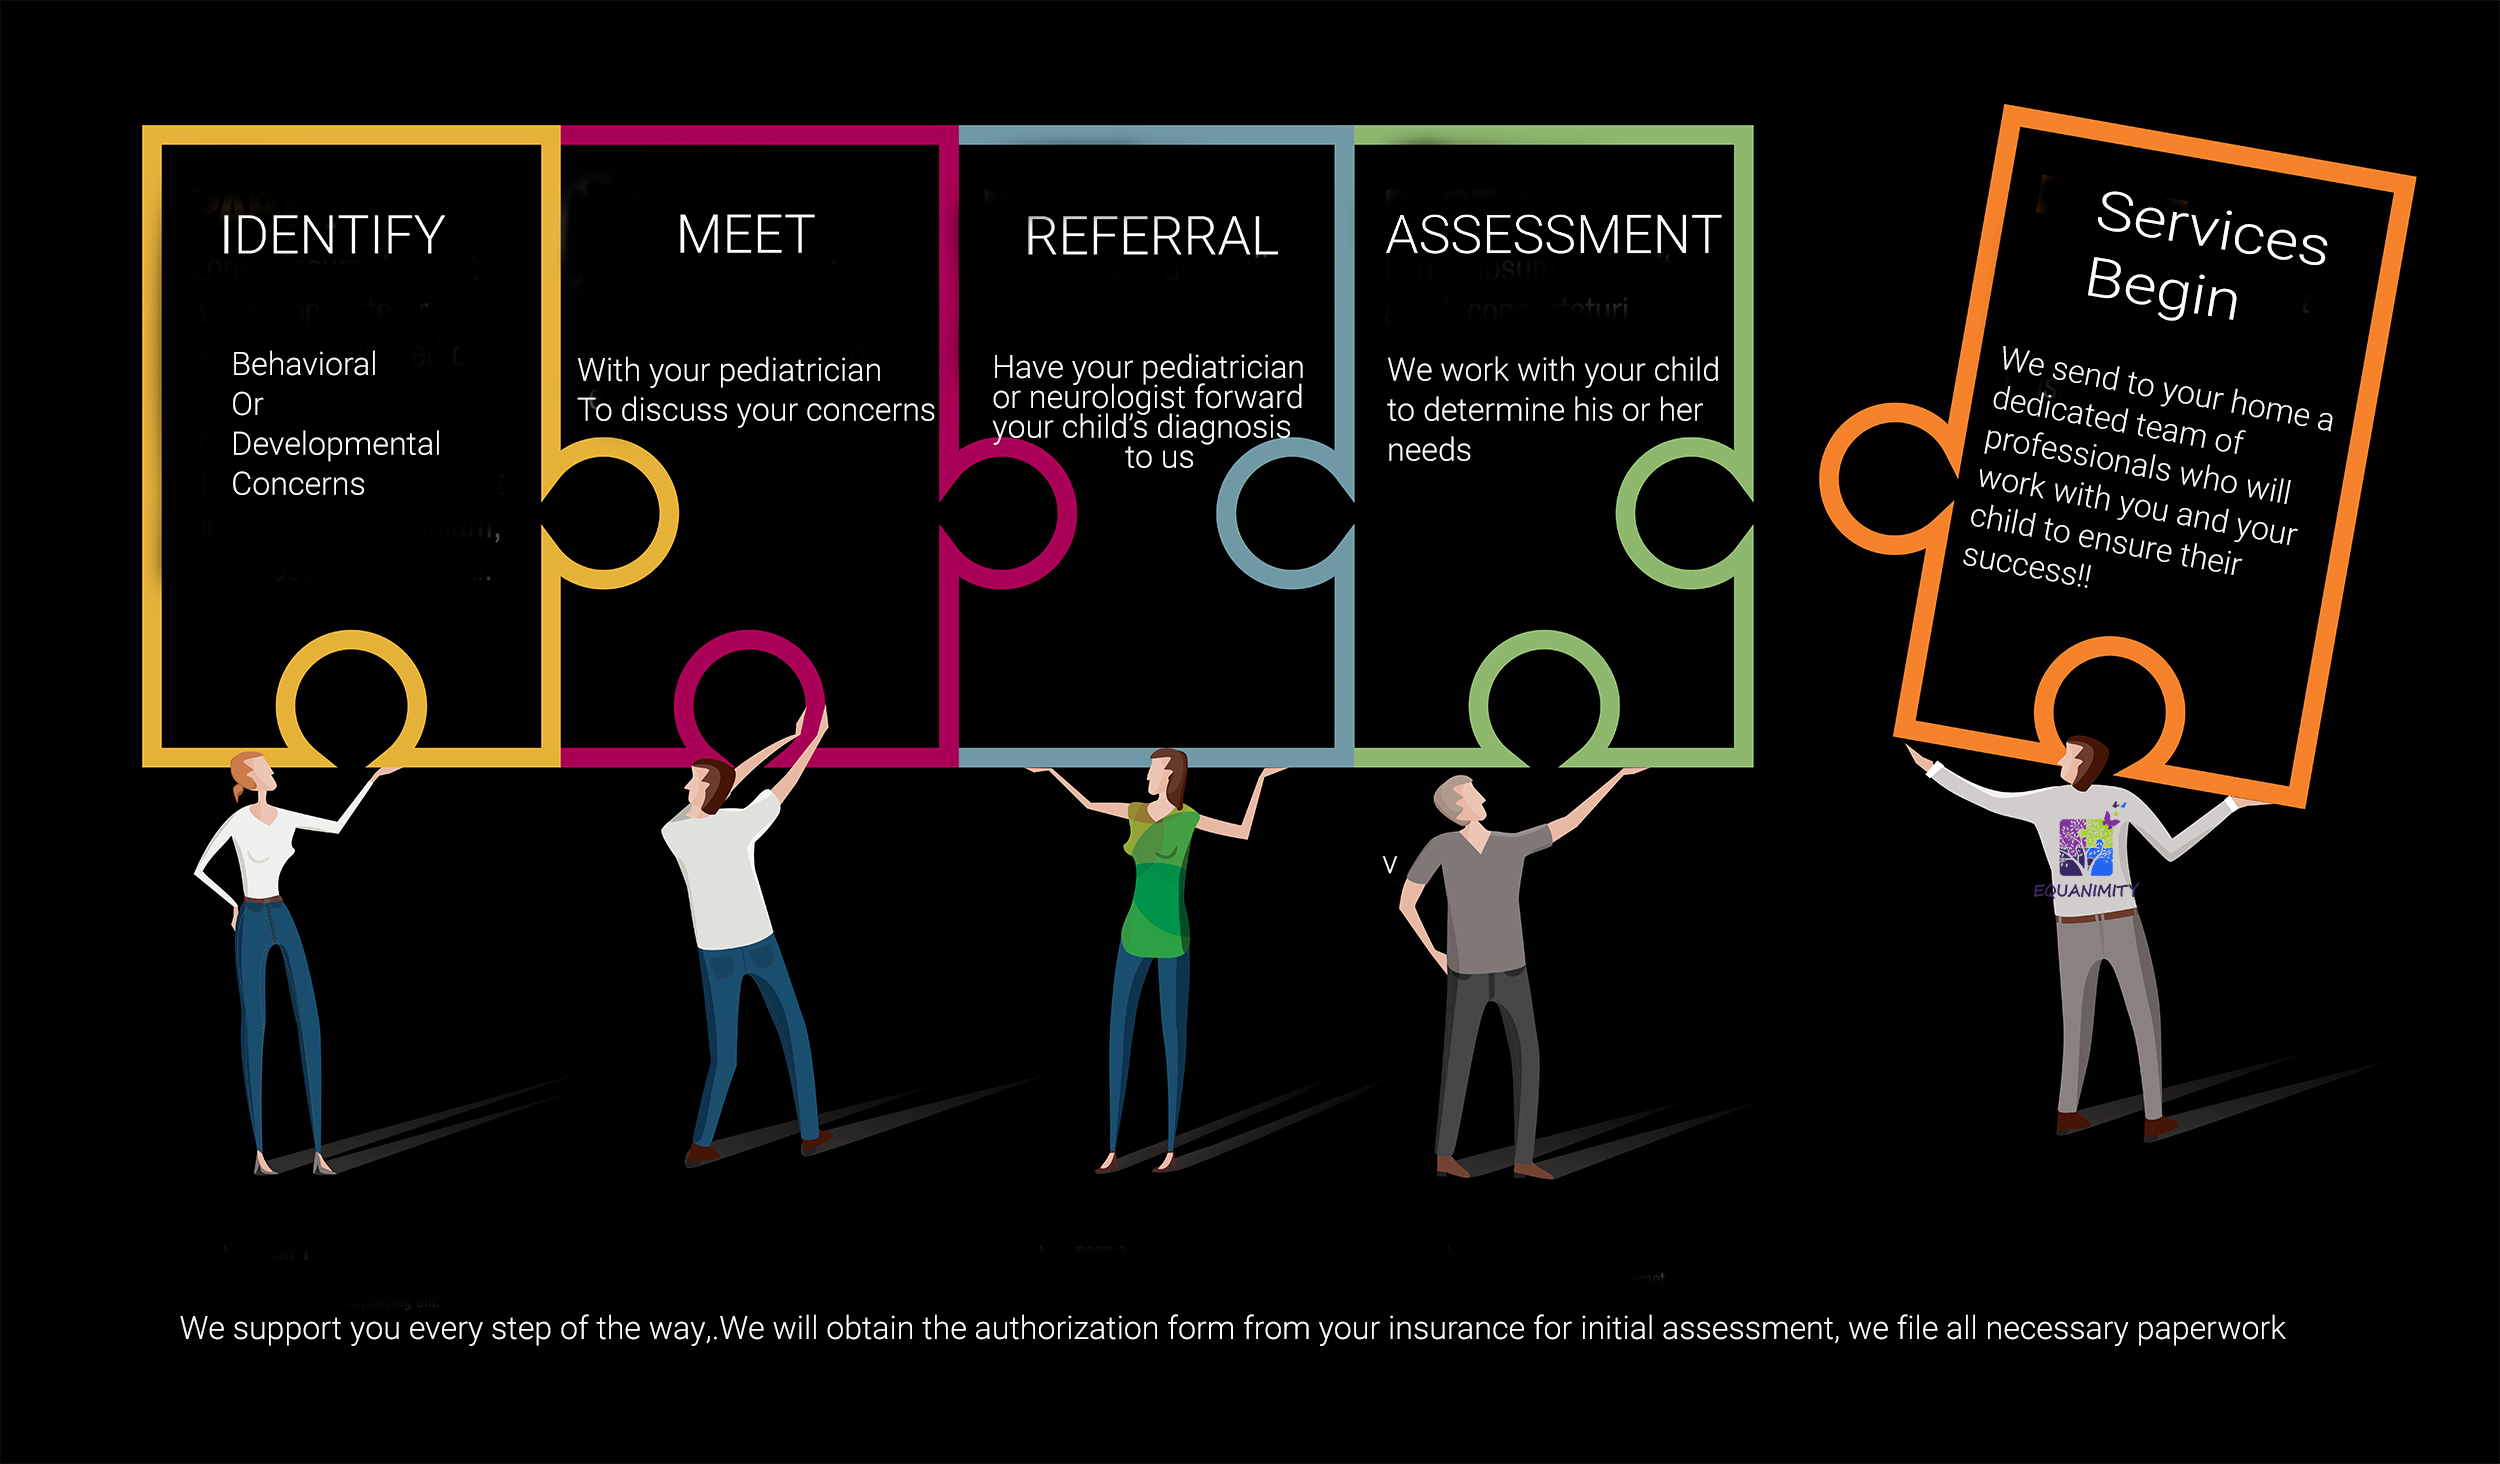 equa_Infographic.jpg